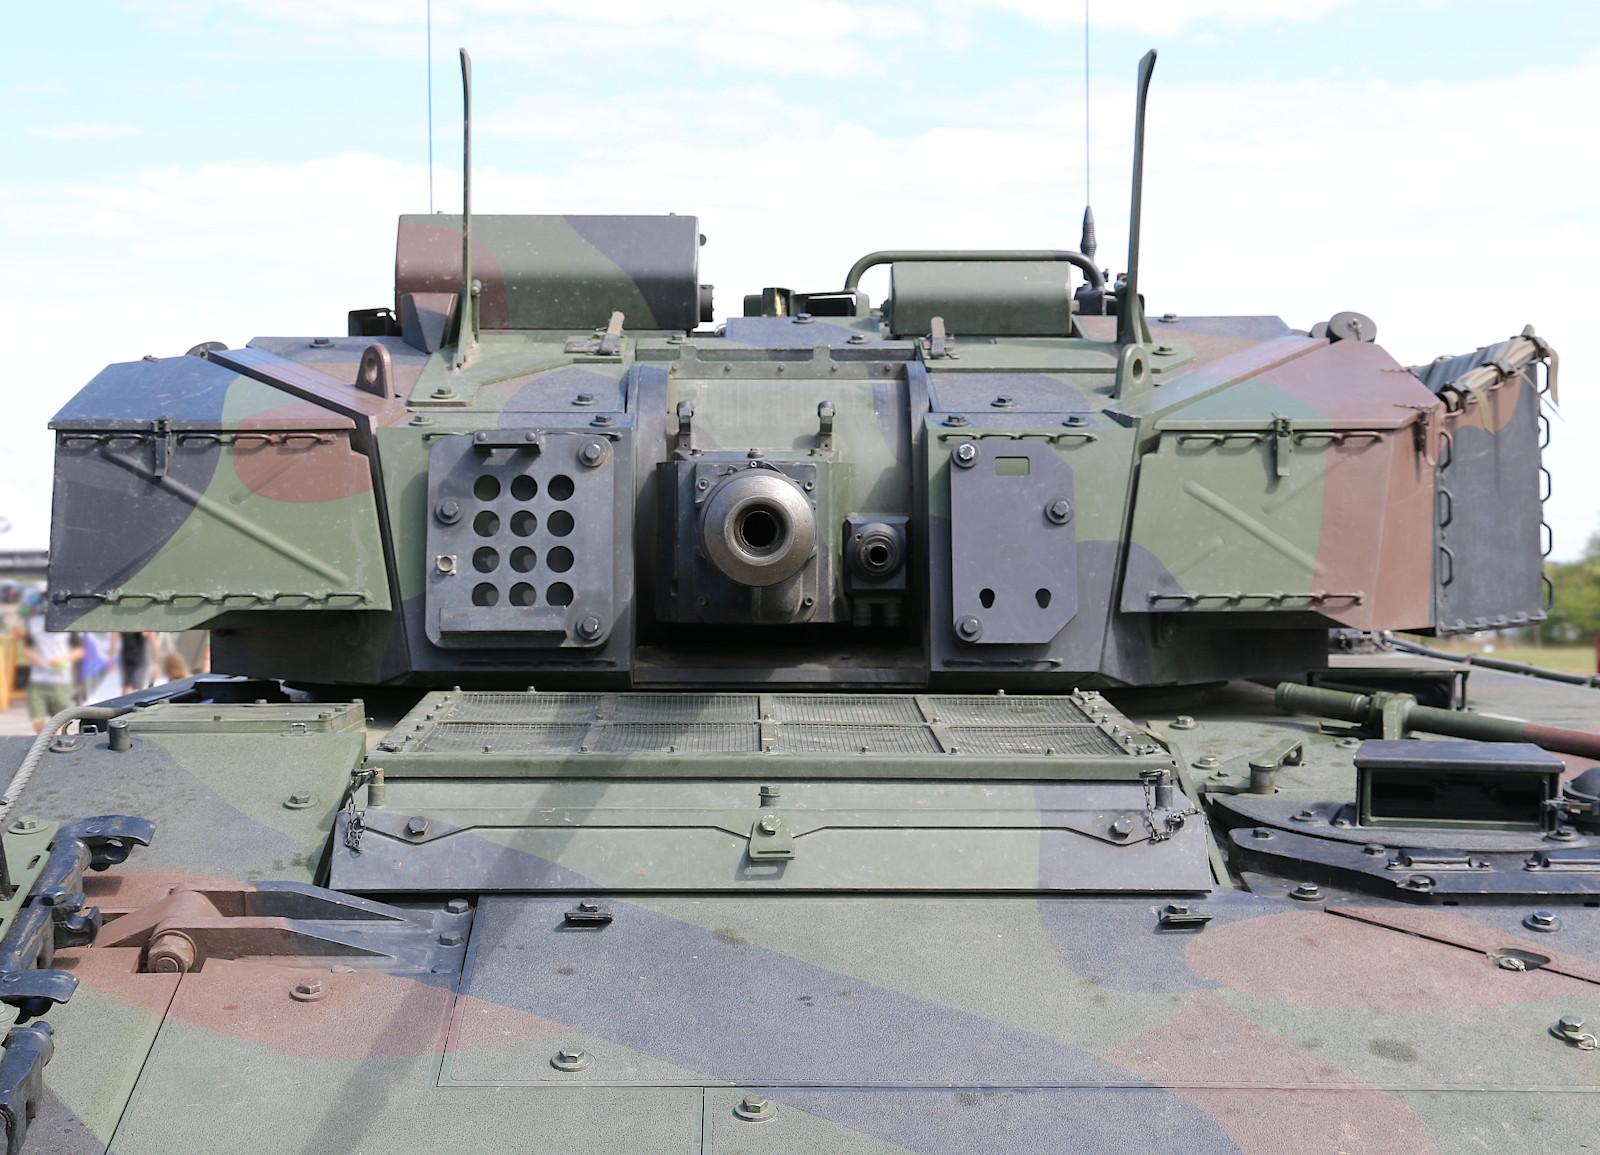 Steyr SP-30 Turm des Ulan mit 30 mm Maschinenkanone Modell MK-30-2 © Doppeladler.com